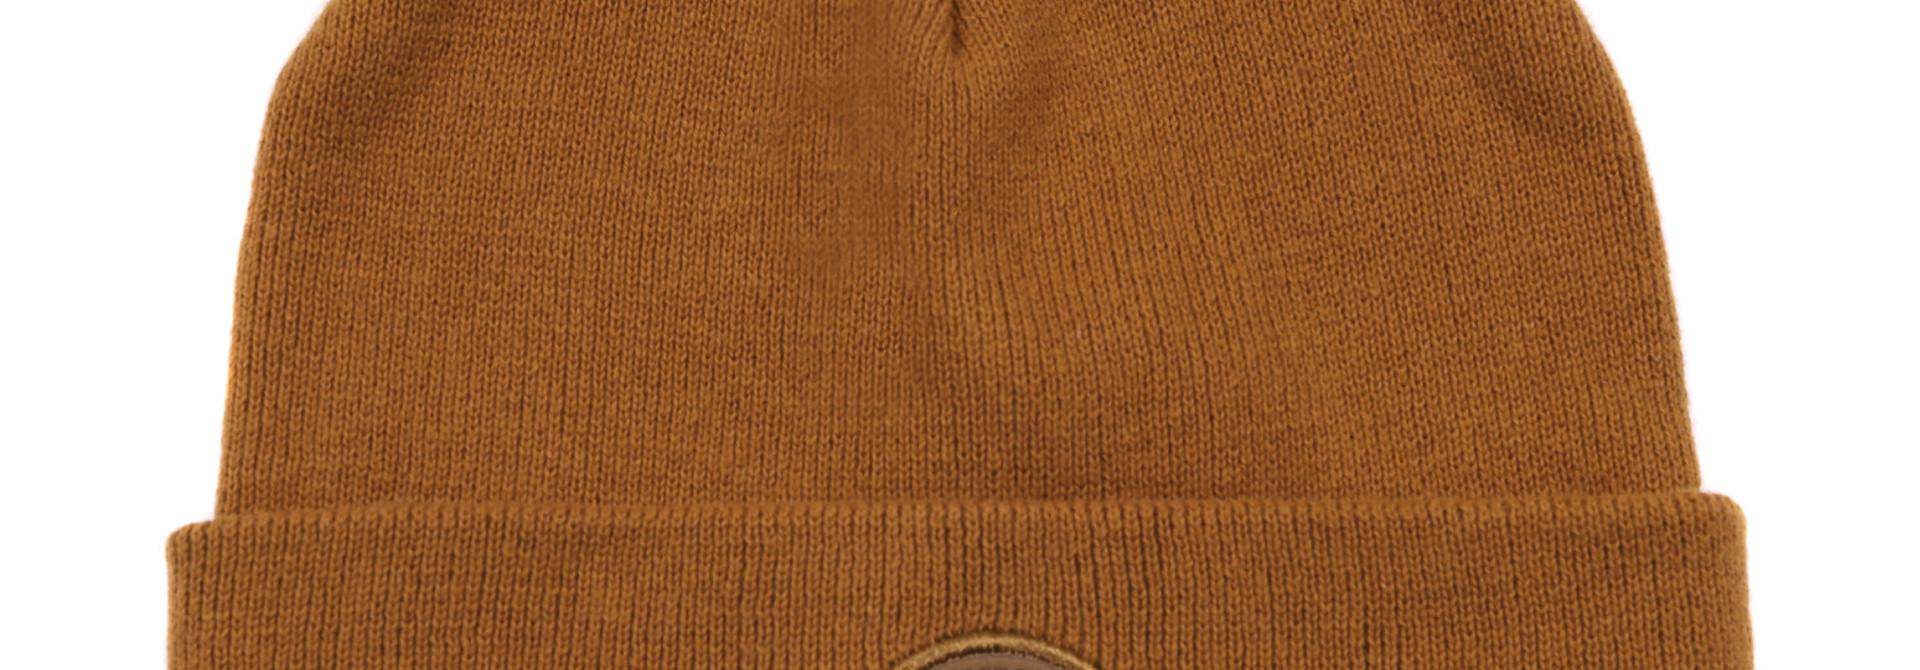 Tuque en tricot Taupe